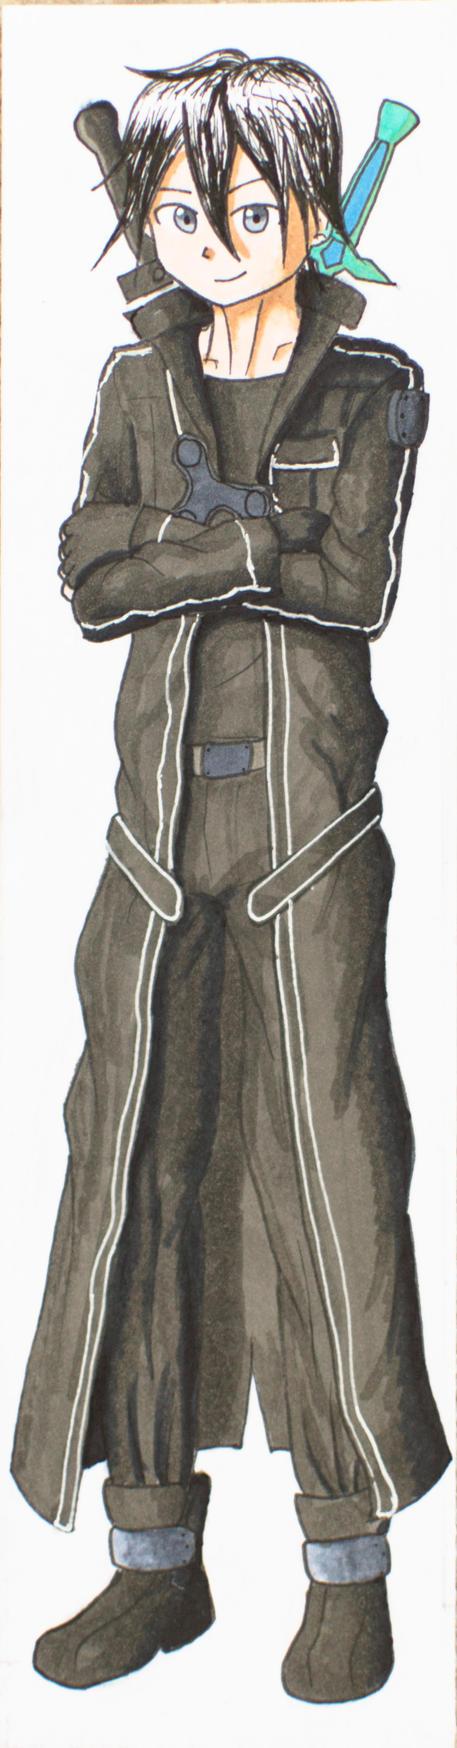 Kirito Bookmark (SAO) by Anths95